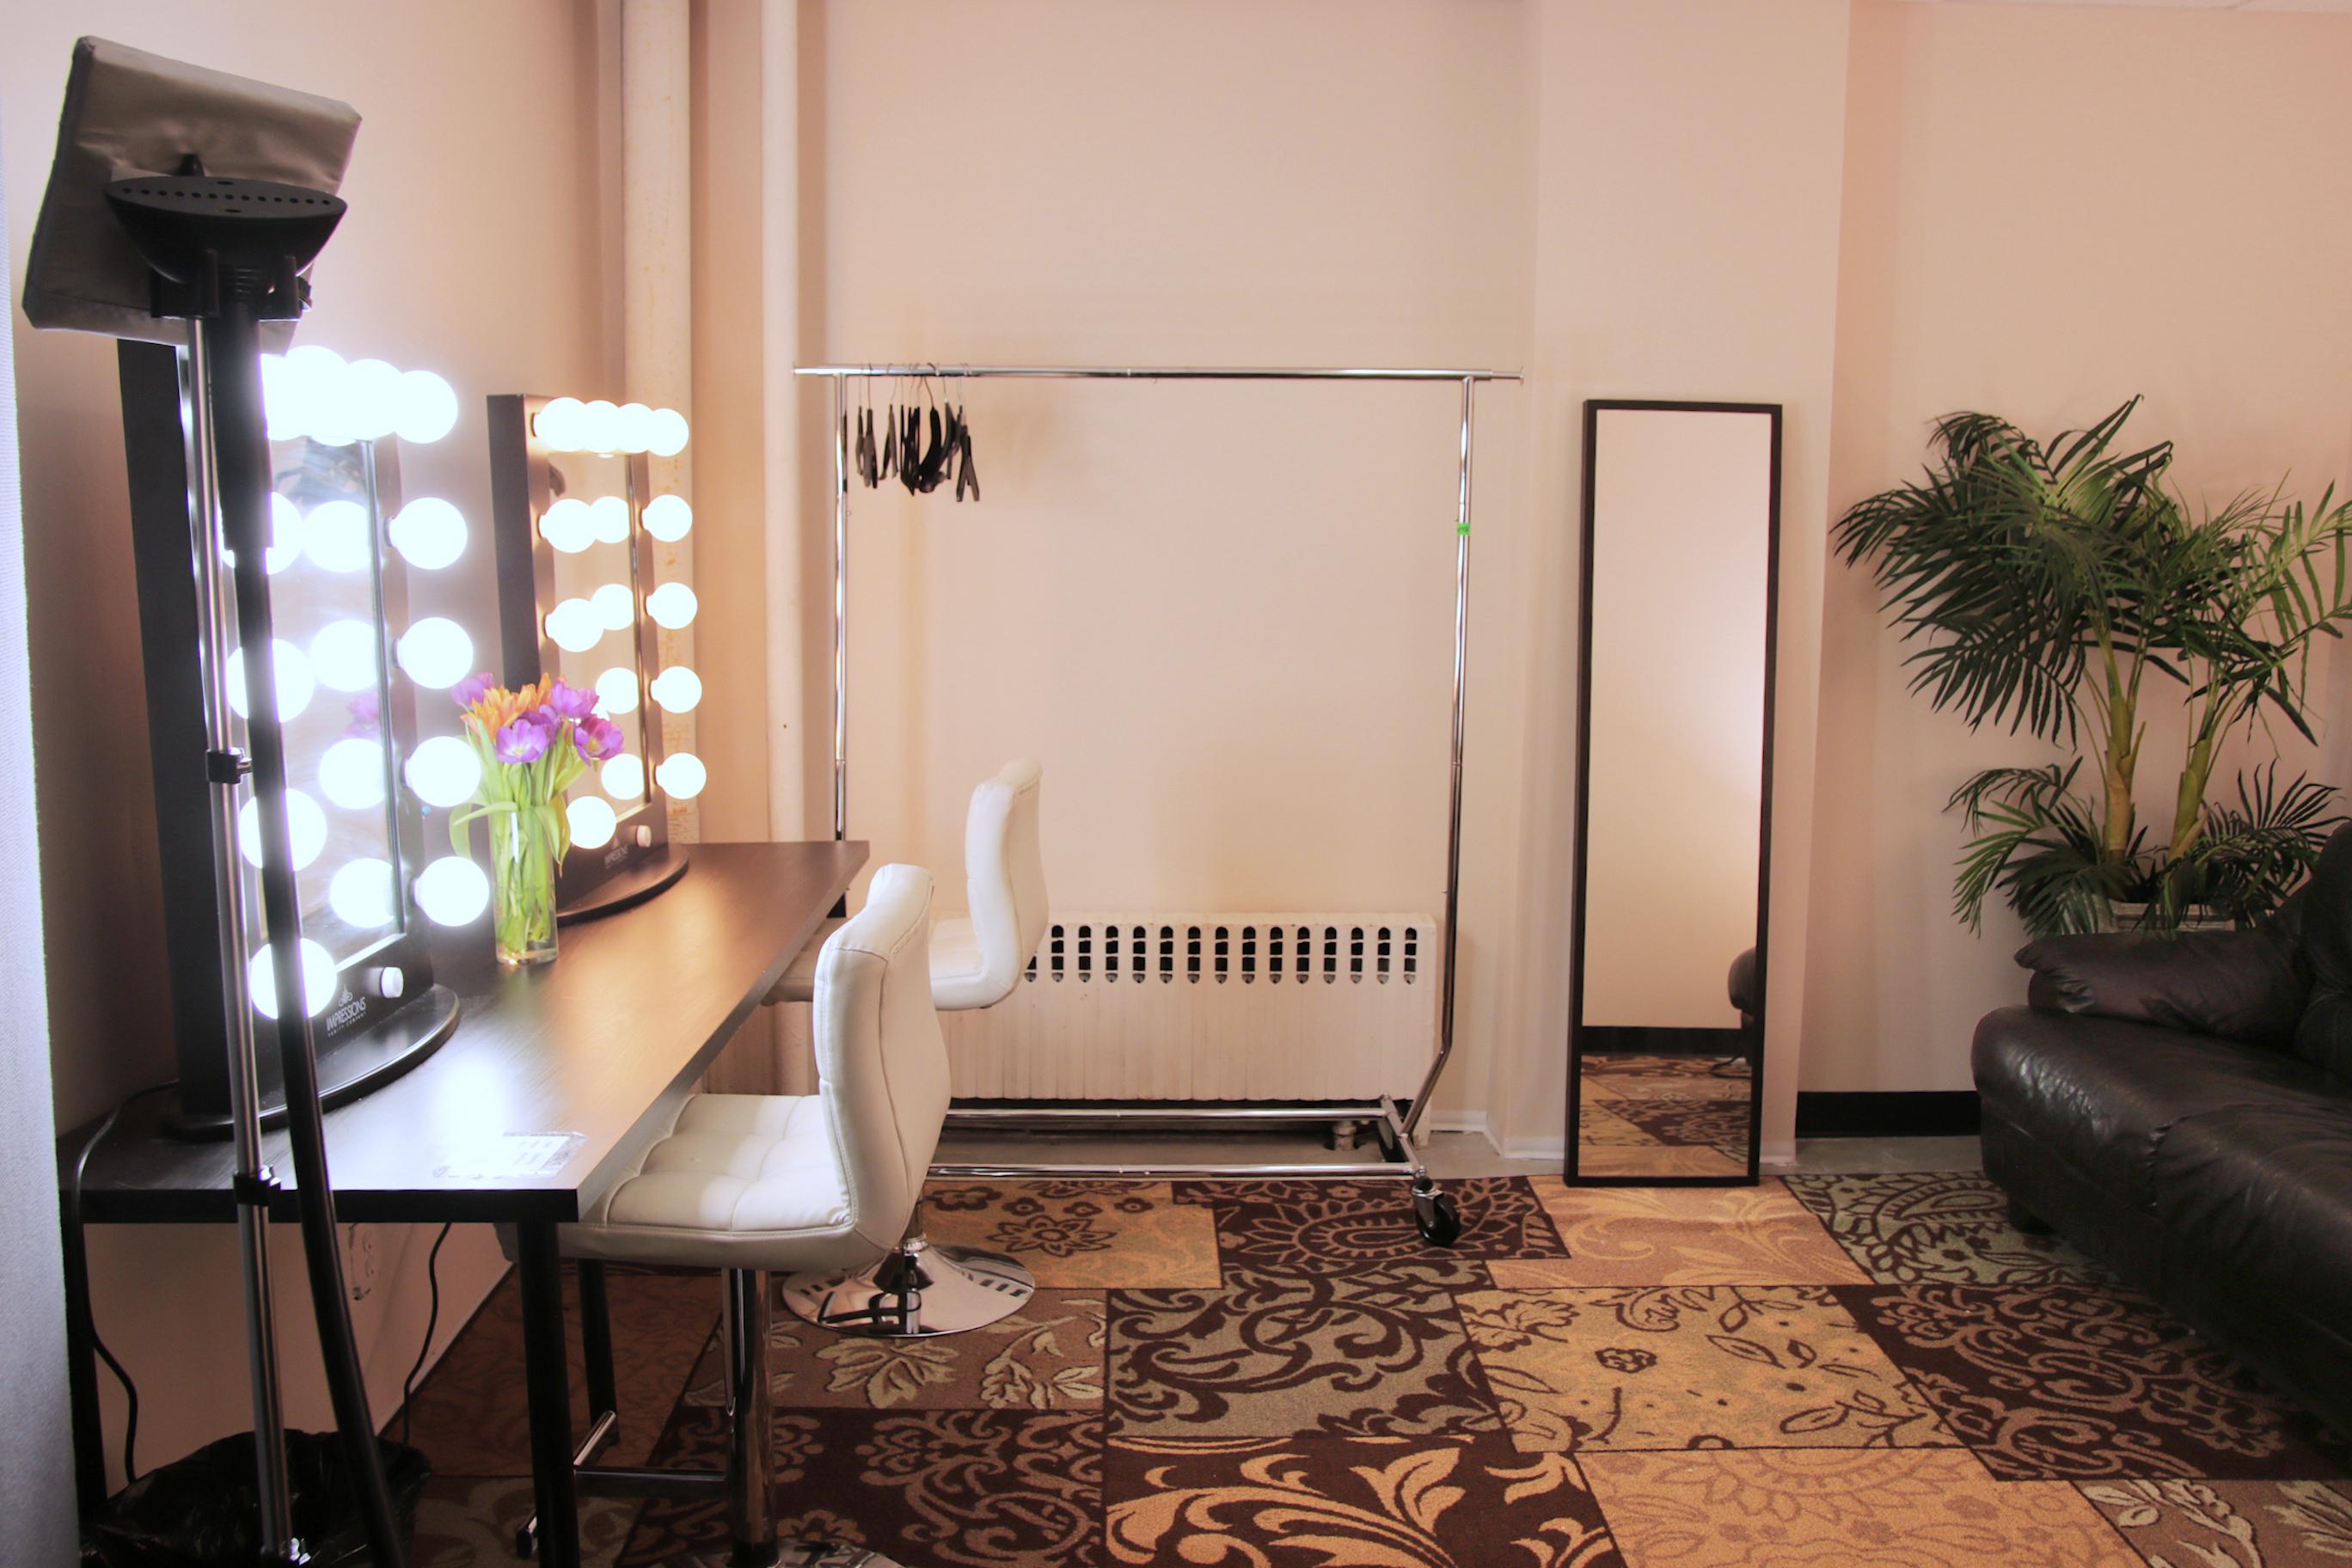 New York Sound Stages - Studio 6A - Big Apple Studios on Make Up Room  id=79078